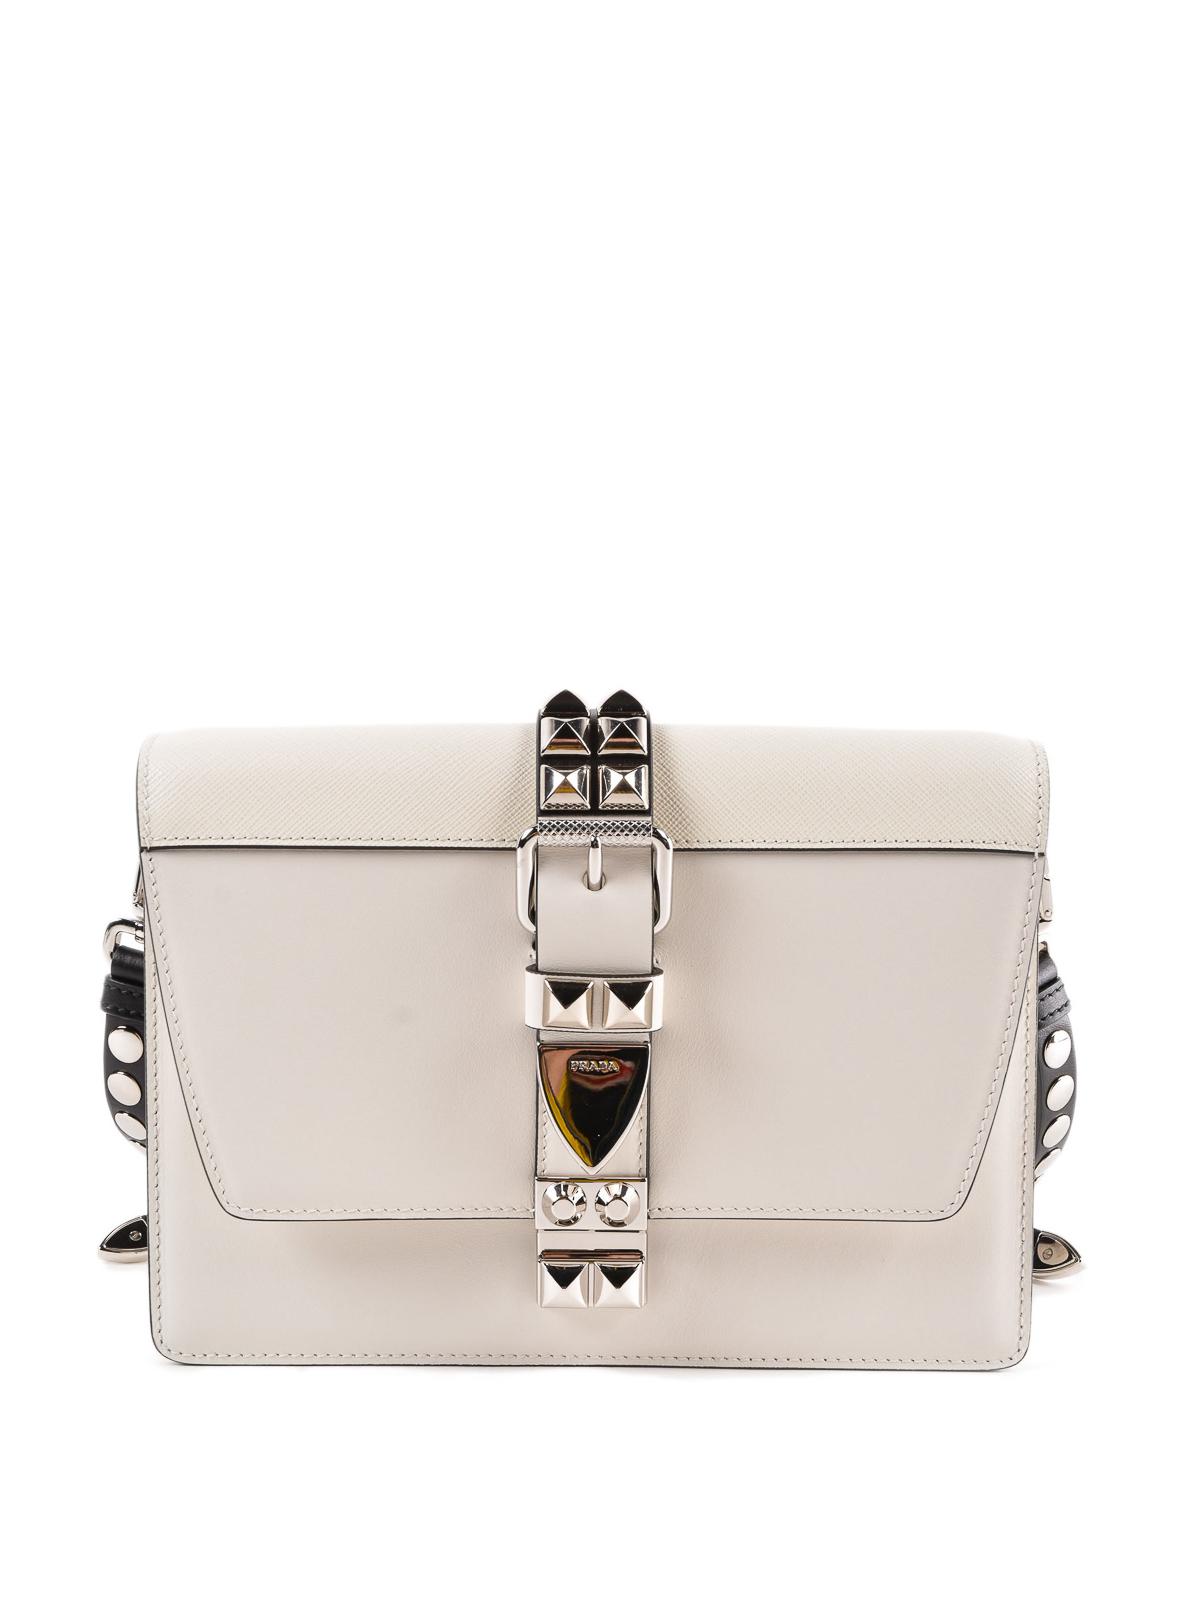 ff1d7d5b25469 Prada - Elektra white leather bag - cross body bags - 1BD1202BB0VOBH964